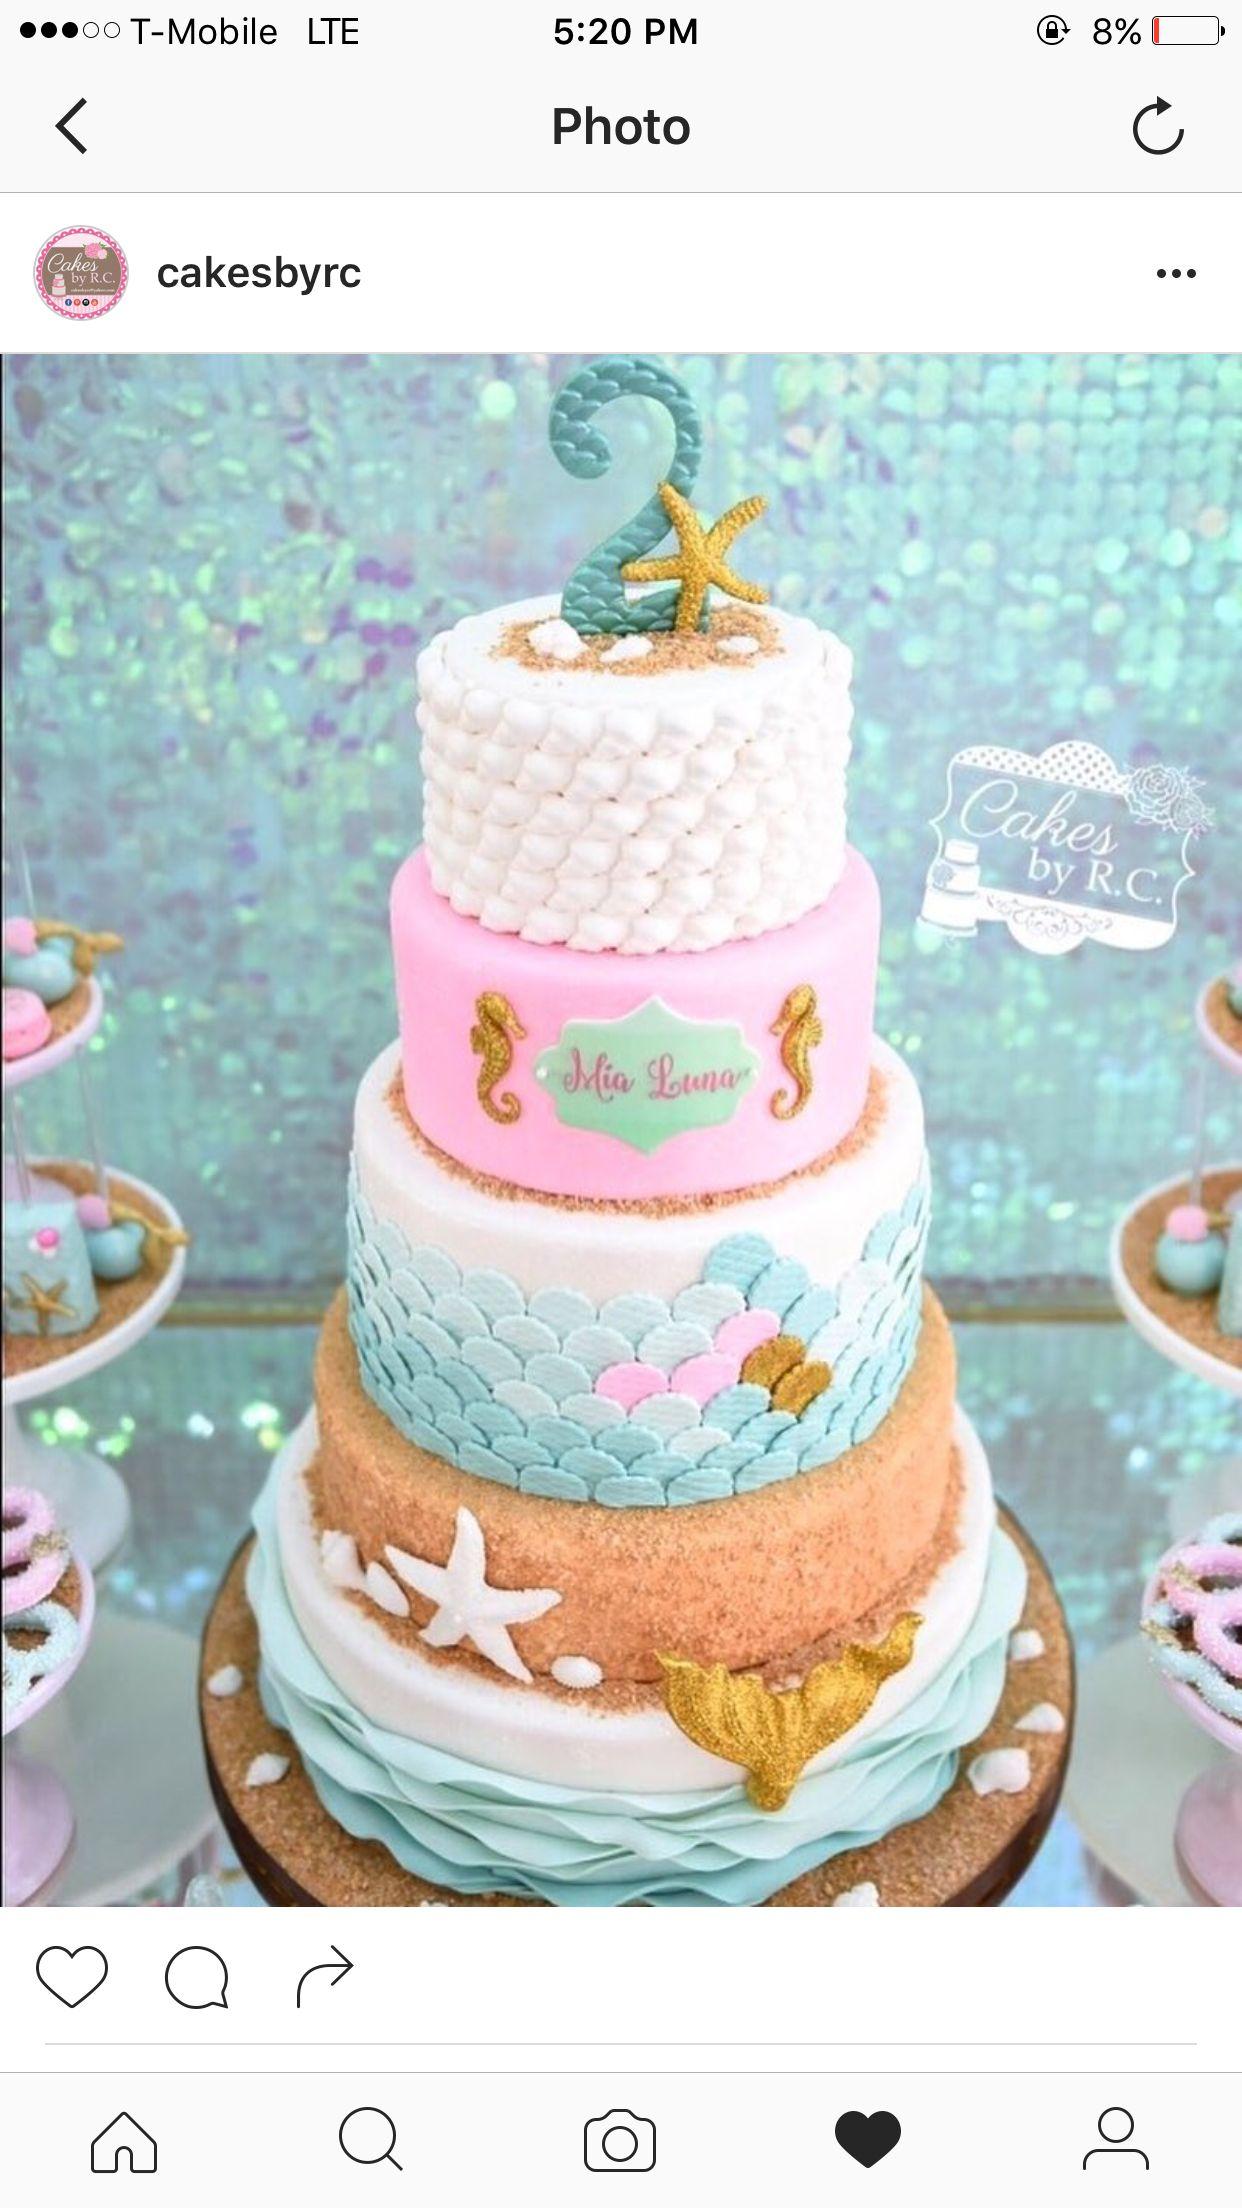 Pin by Kelly Gonzalez on under the sea birthday Pinterest Birthdays